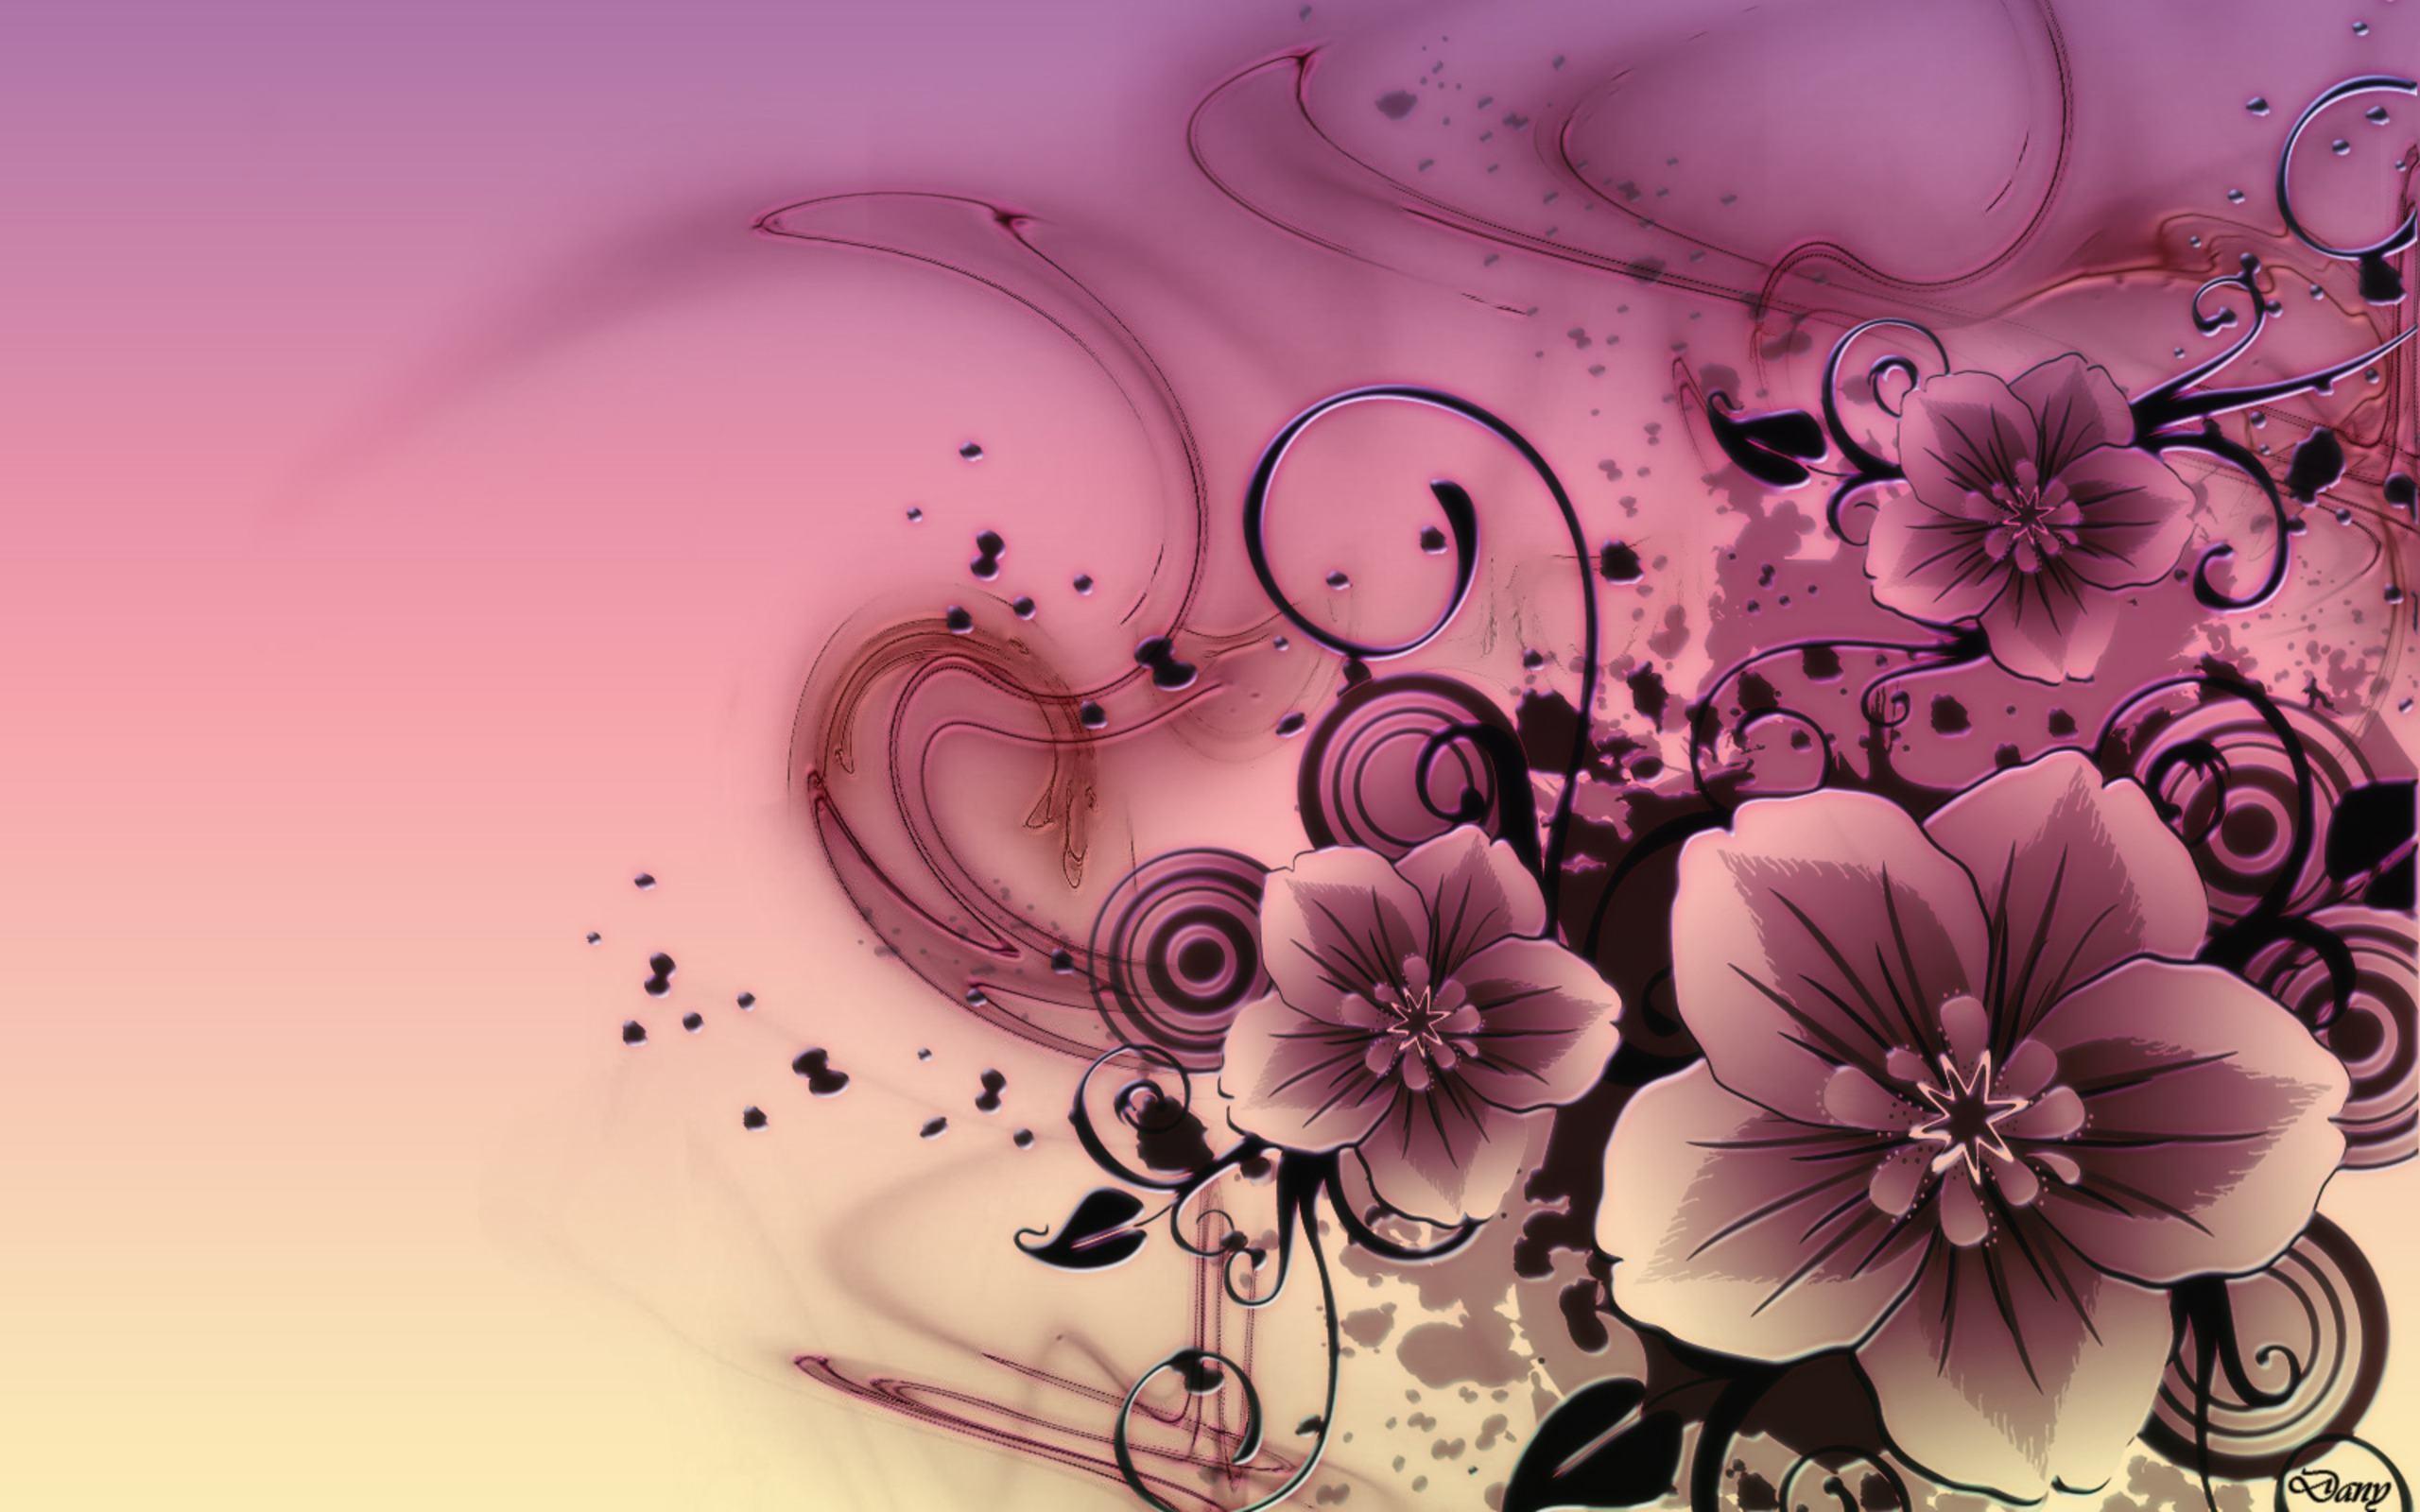 Flowers wallpapers for desktop background full screen